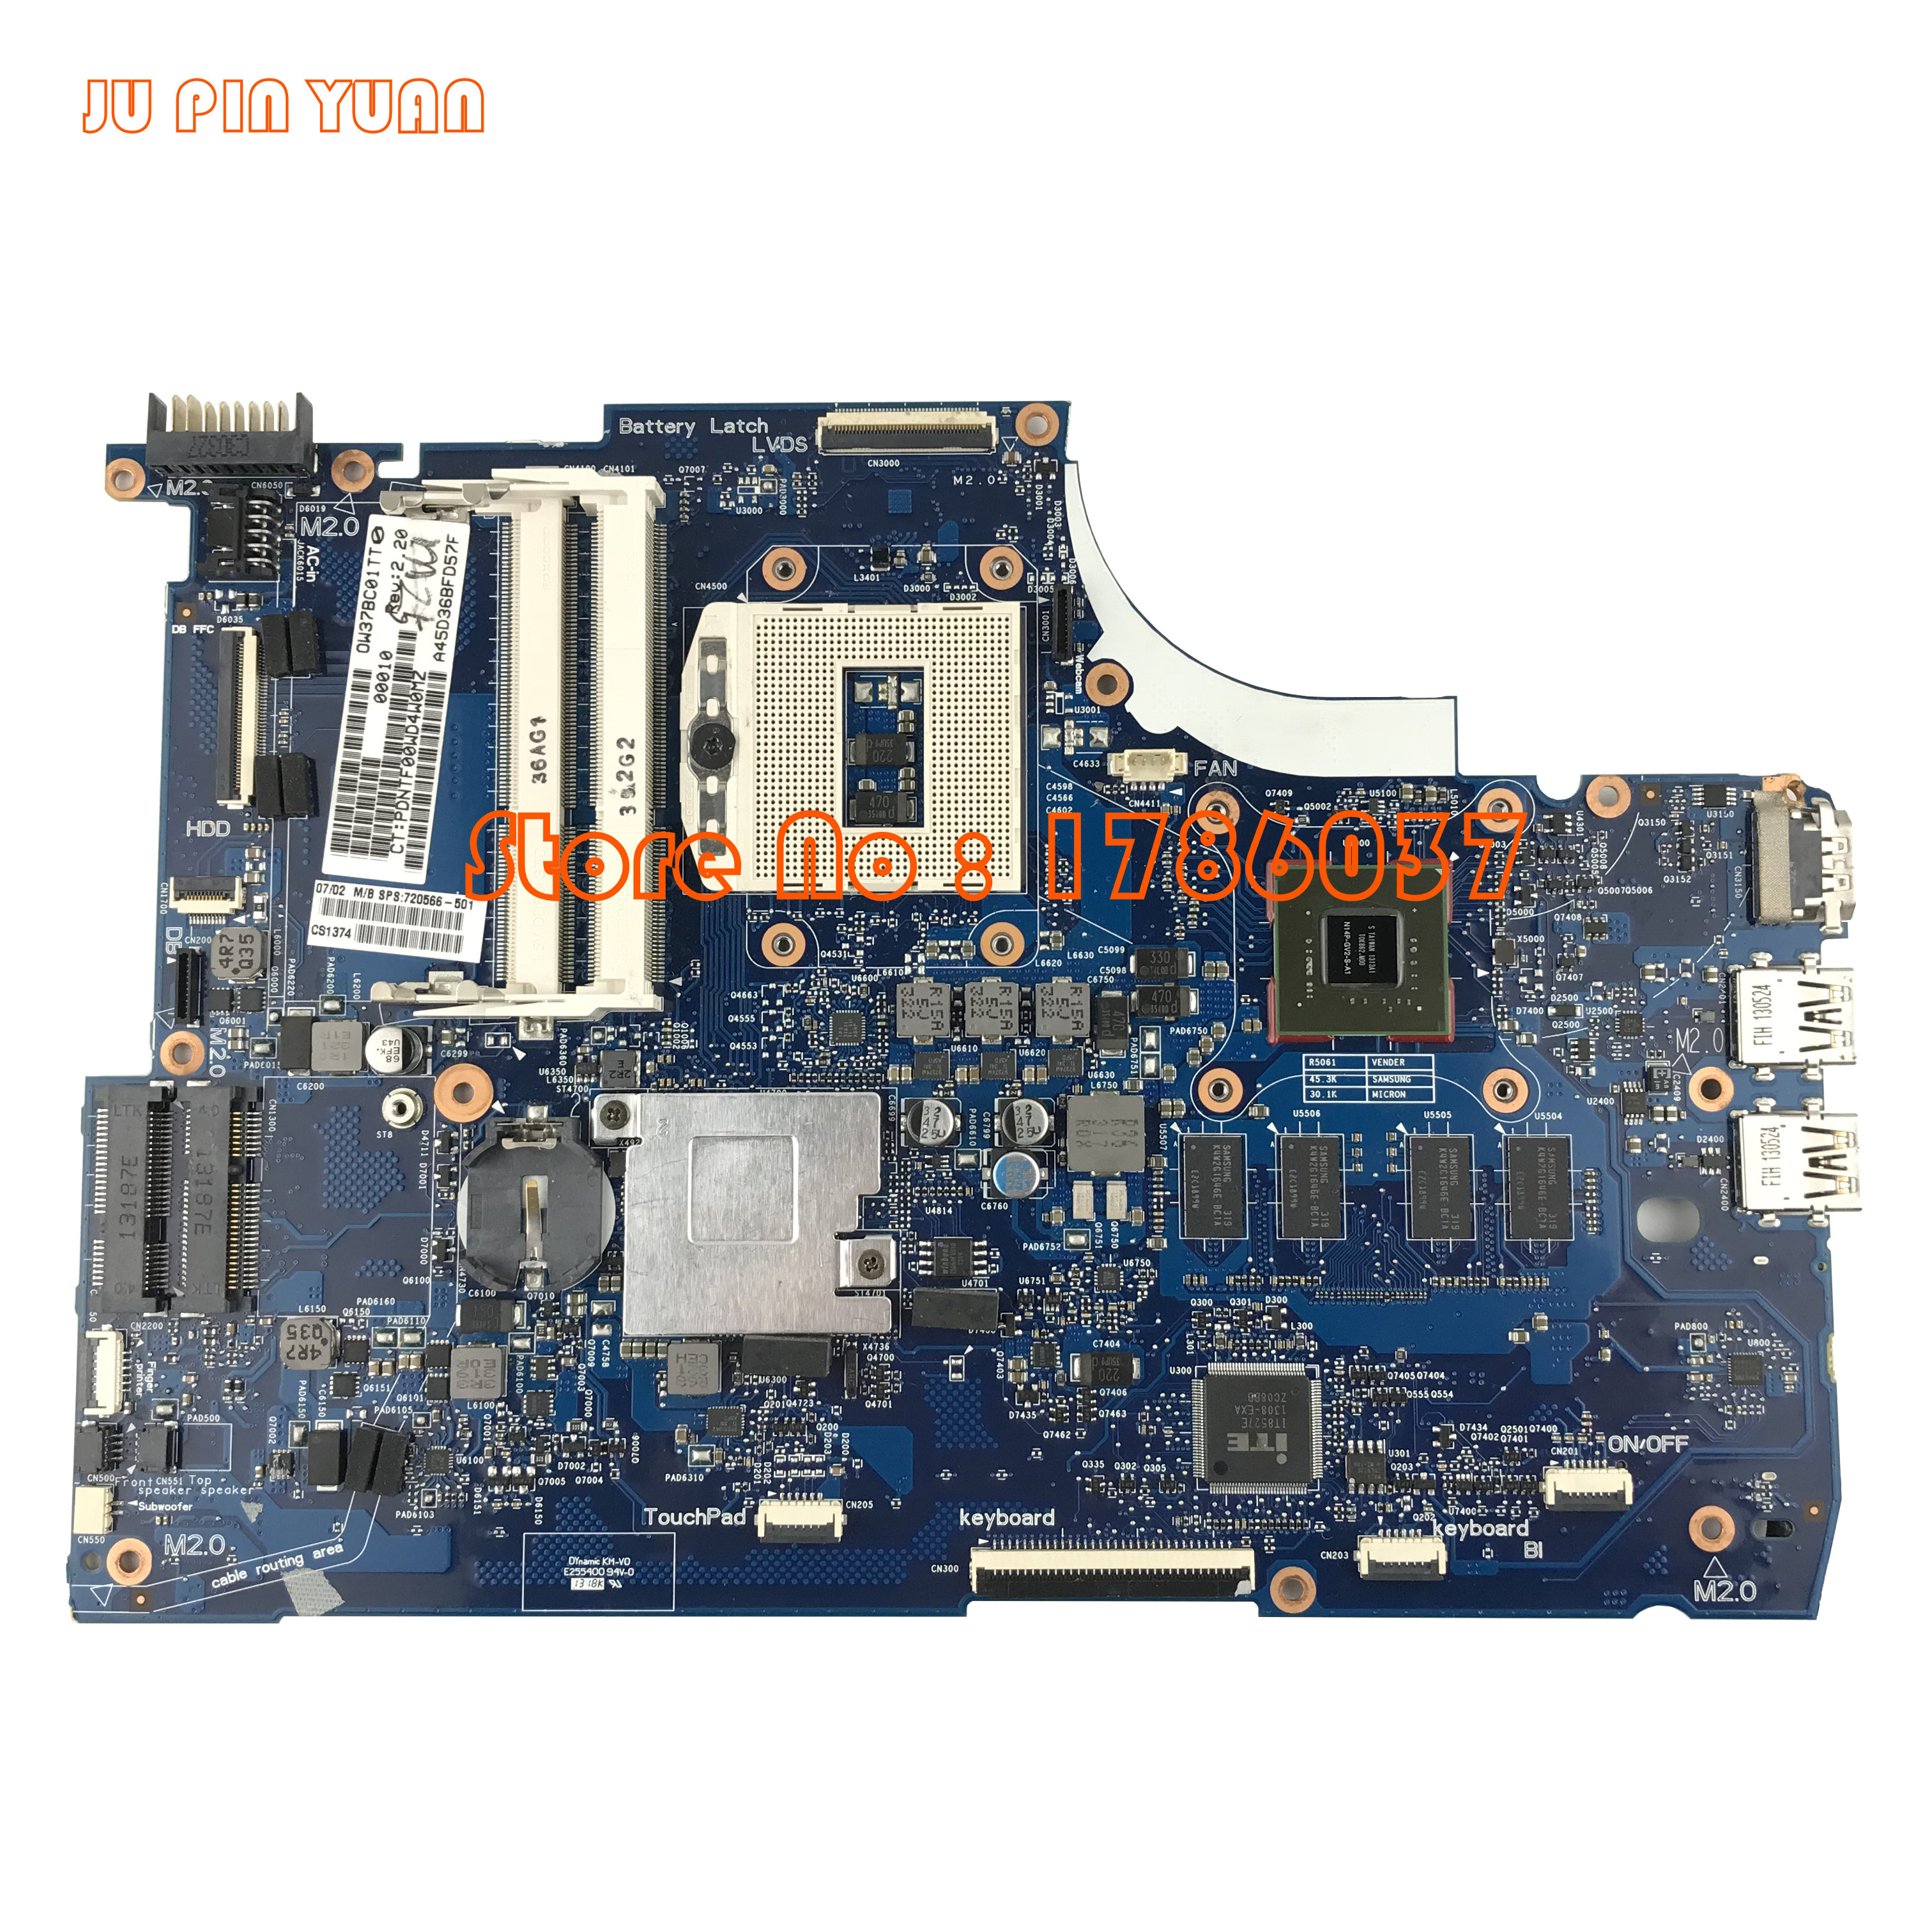 JU PIN YUAN 720566-501 720566-001 para HP ENVY 15-J 15T-J serie placa base 740M / 2G HM87 Todas las funciones 100% totalmente probadas